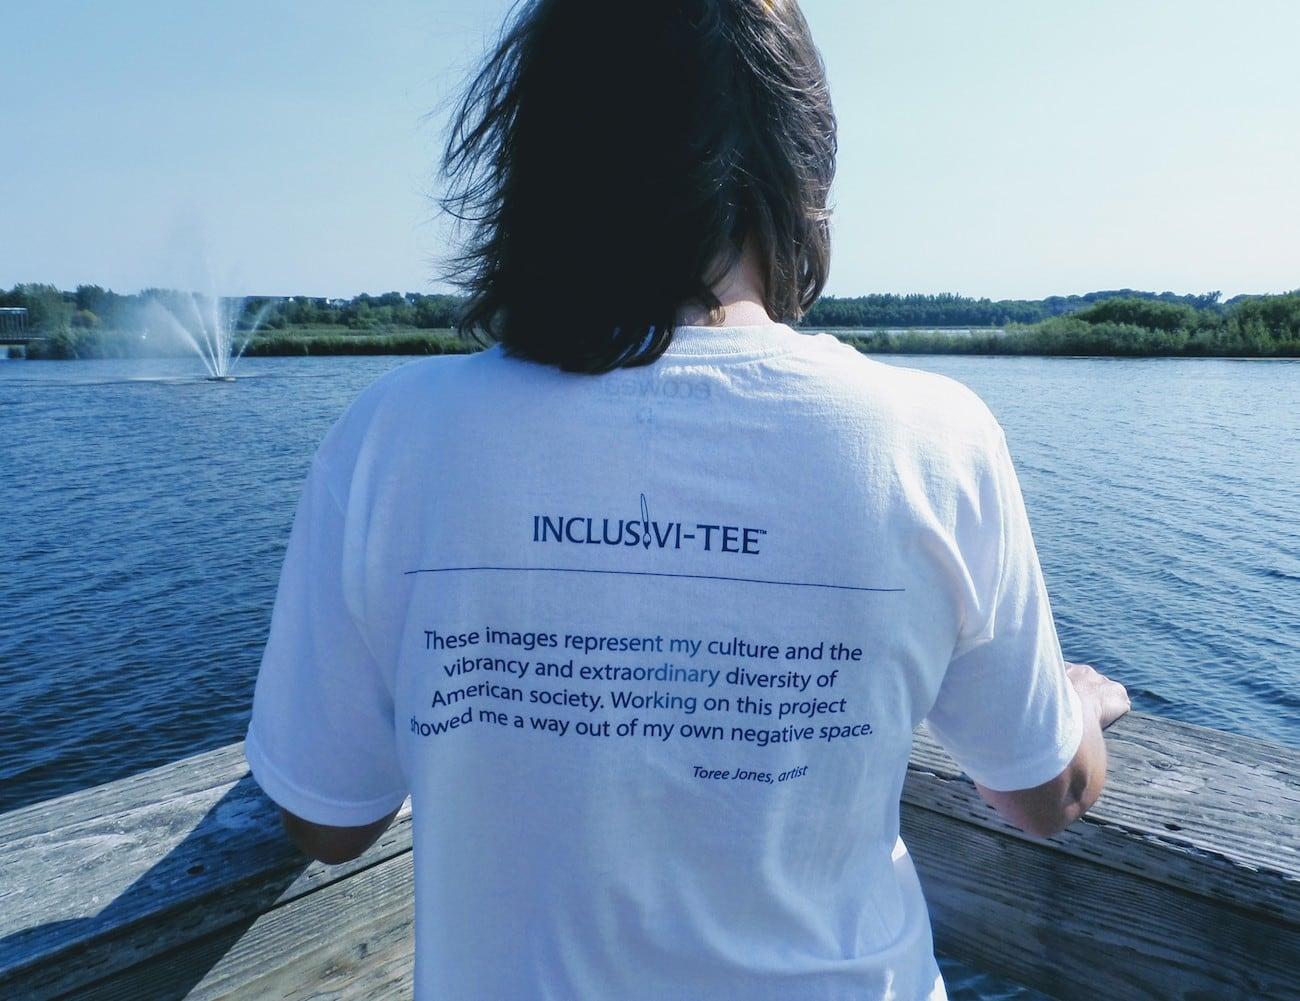 Inclusivi-tee Artist-Designed T-shirts